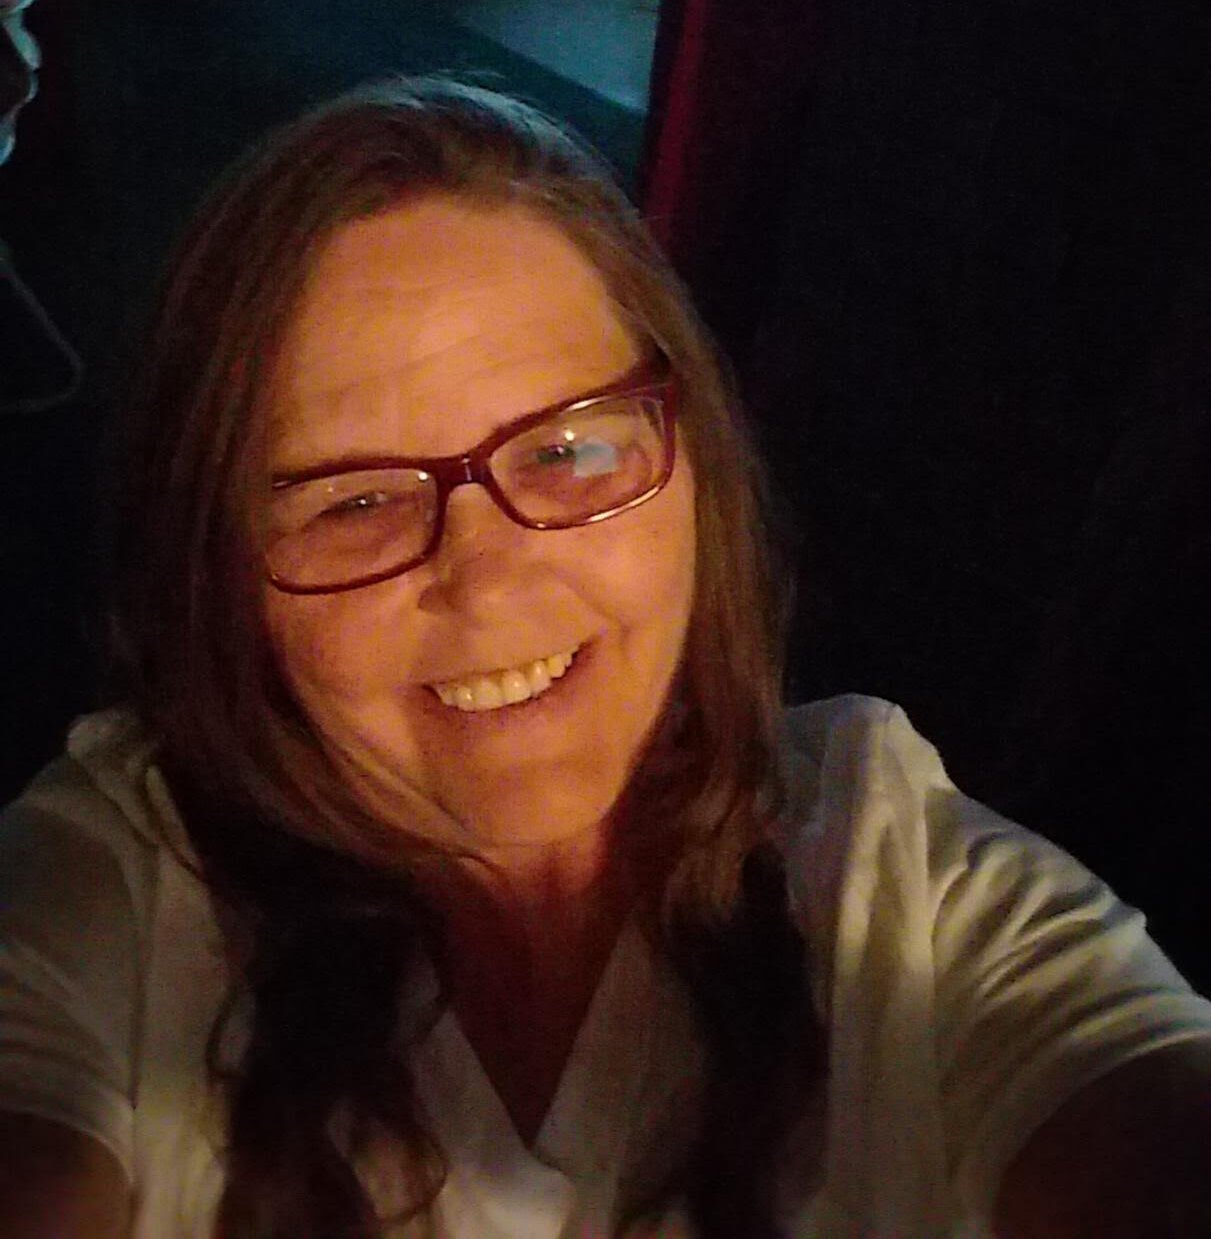 Danette Garlis owns the Greek restaurant, Elaine's in Fort Morgan, Colo.